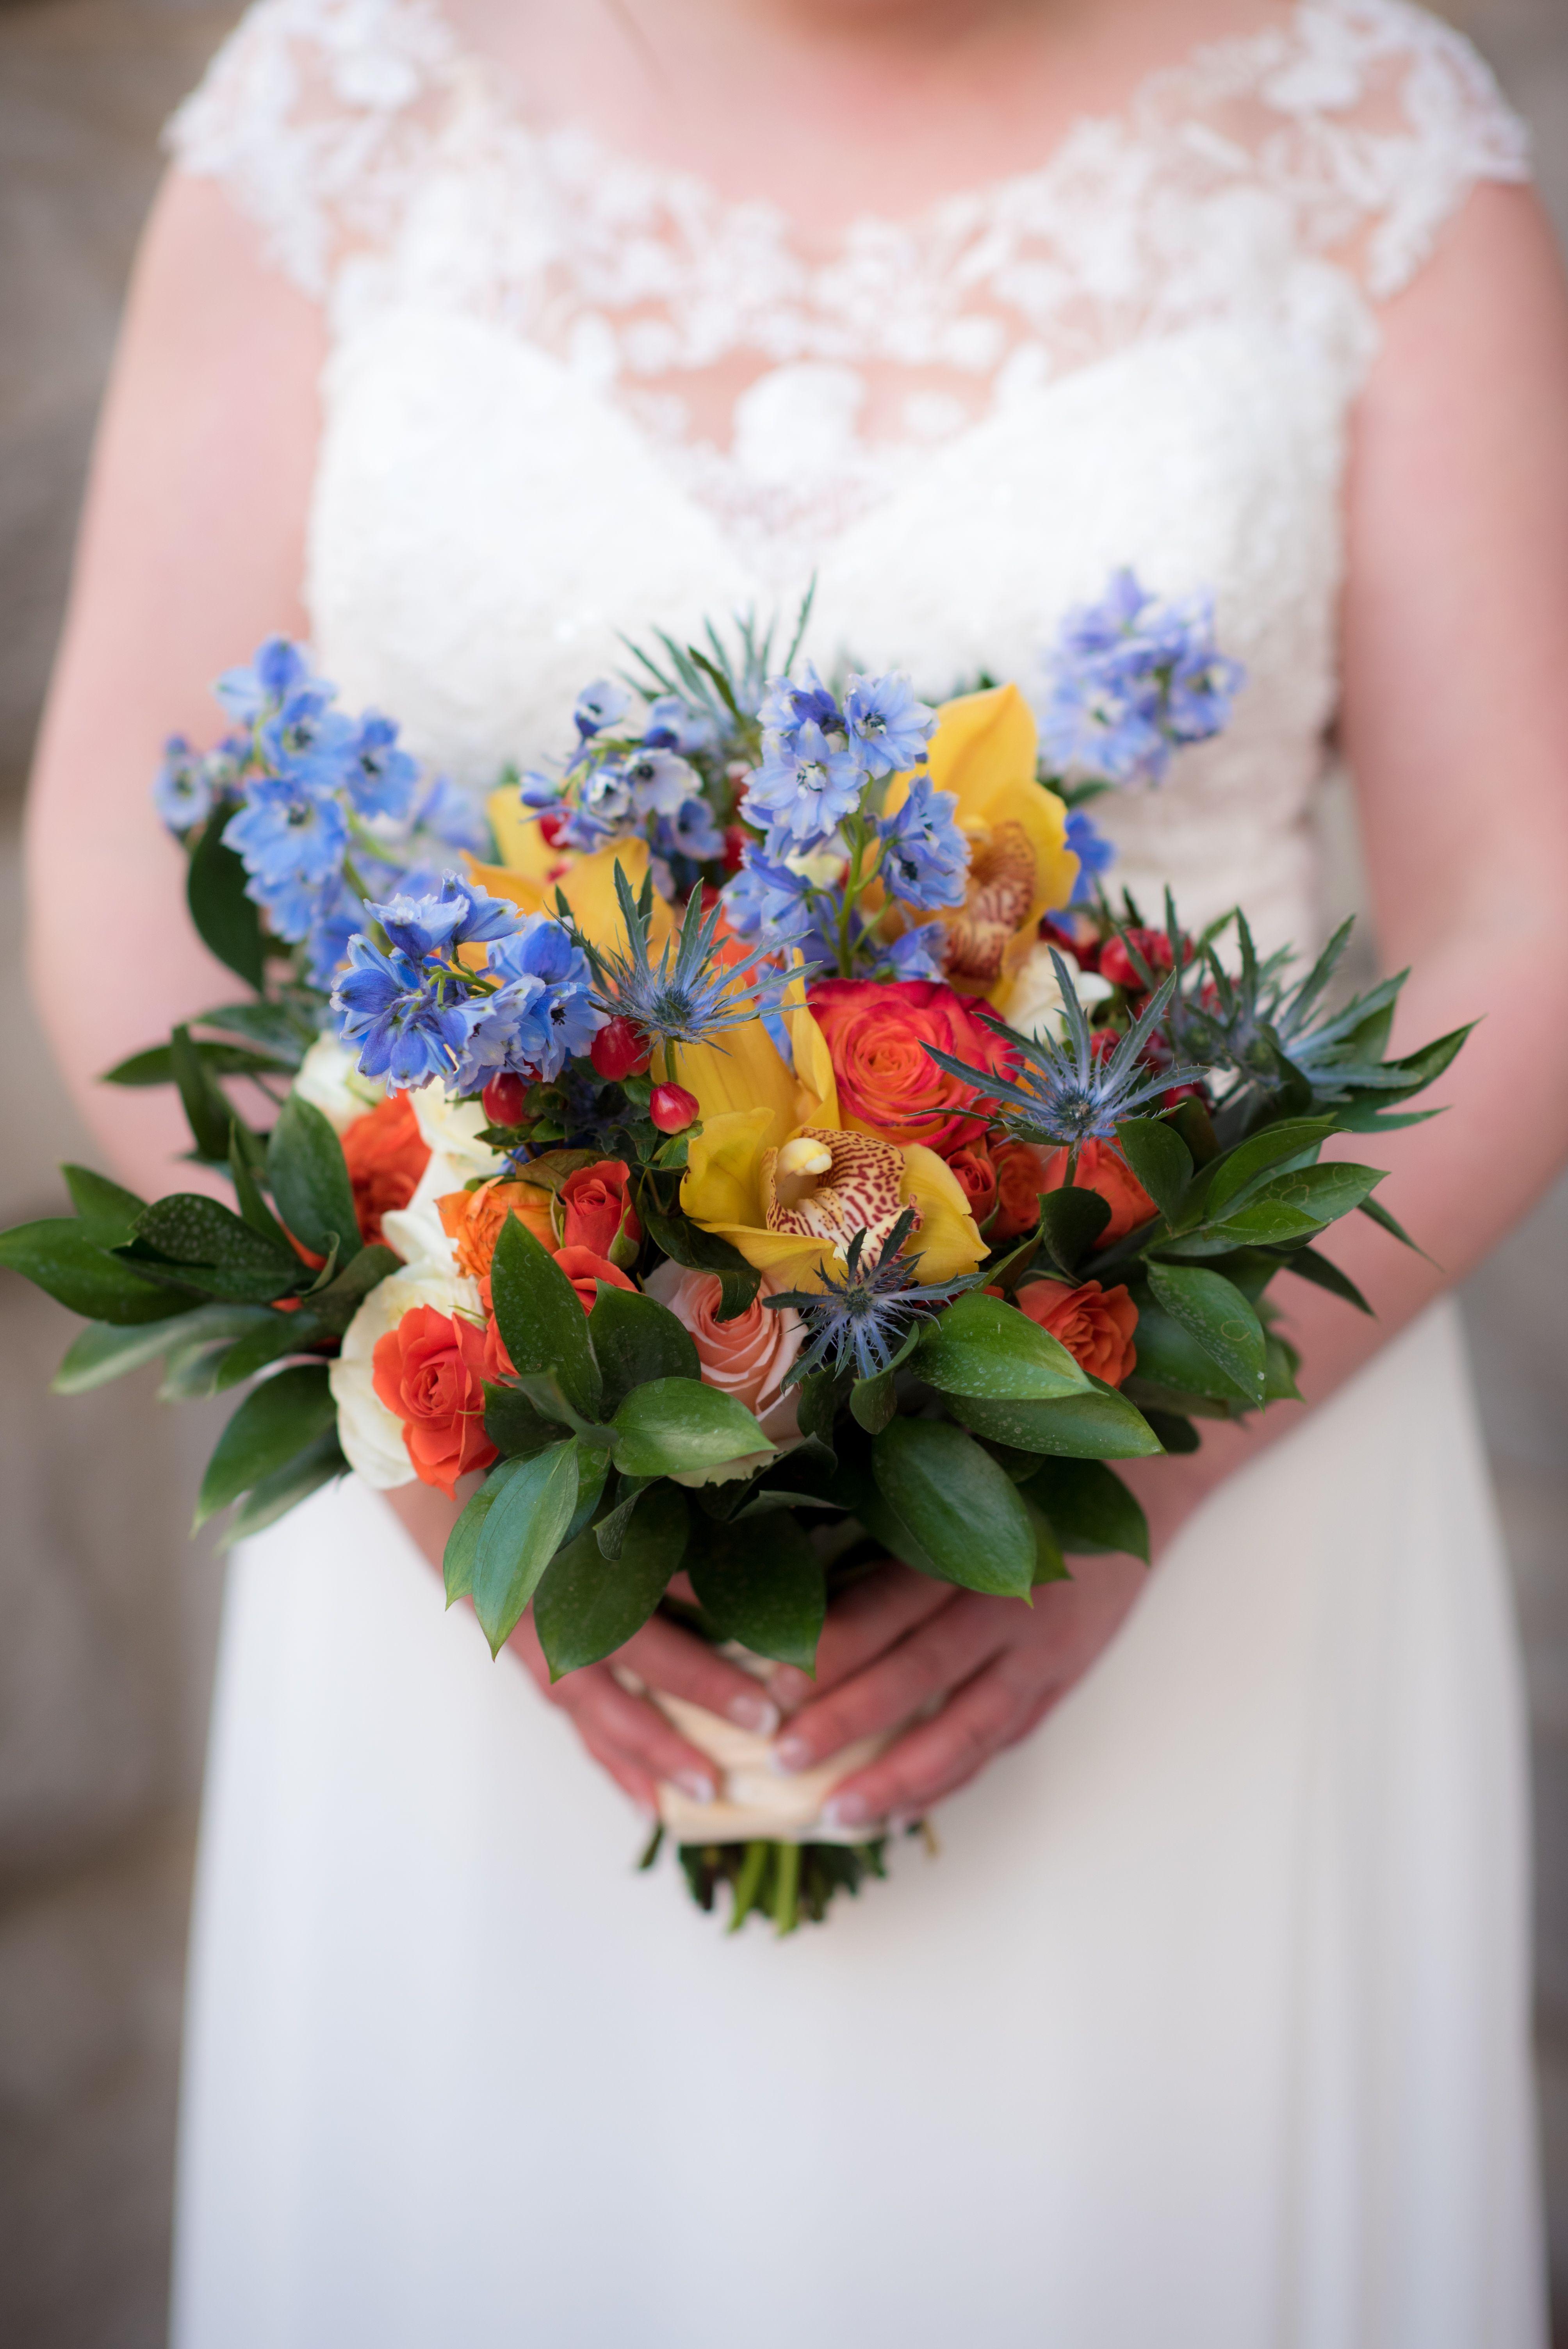 Bridal Bouquets In 2020 Bridal Bouquet Floral Wedding Wedding Bouquets